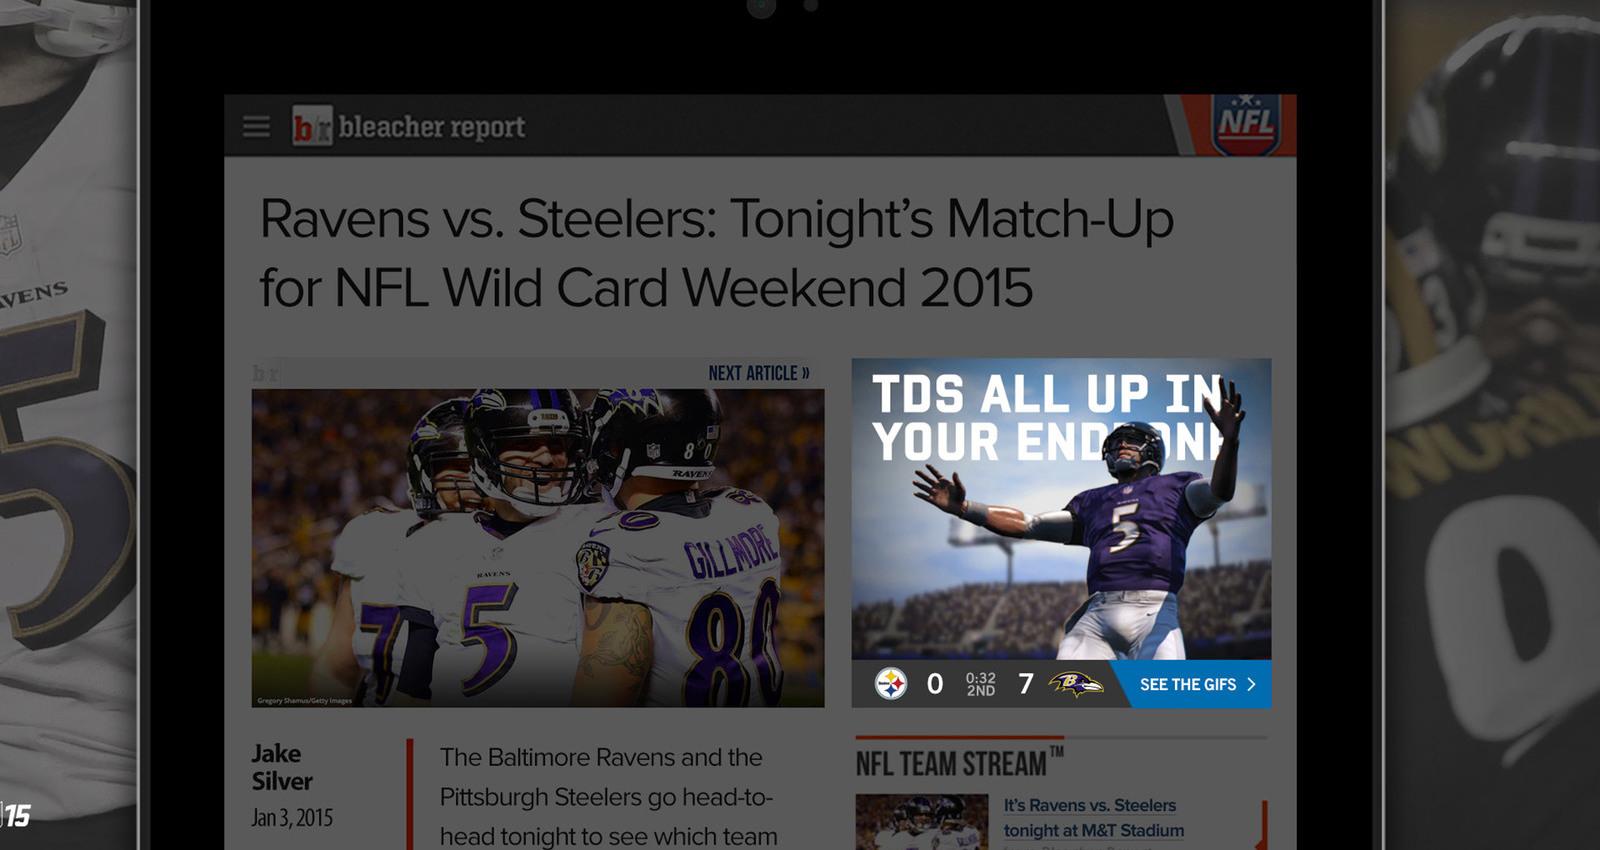 EA Sports Madden GIFERATOR: A Google Art, Copy & Code Project